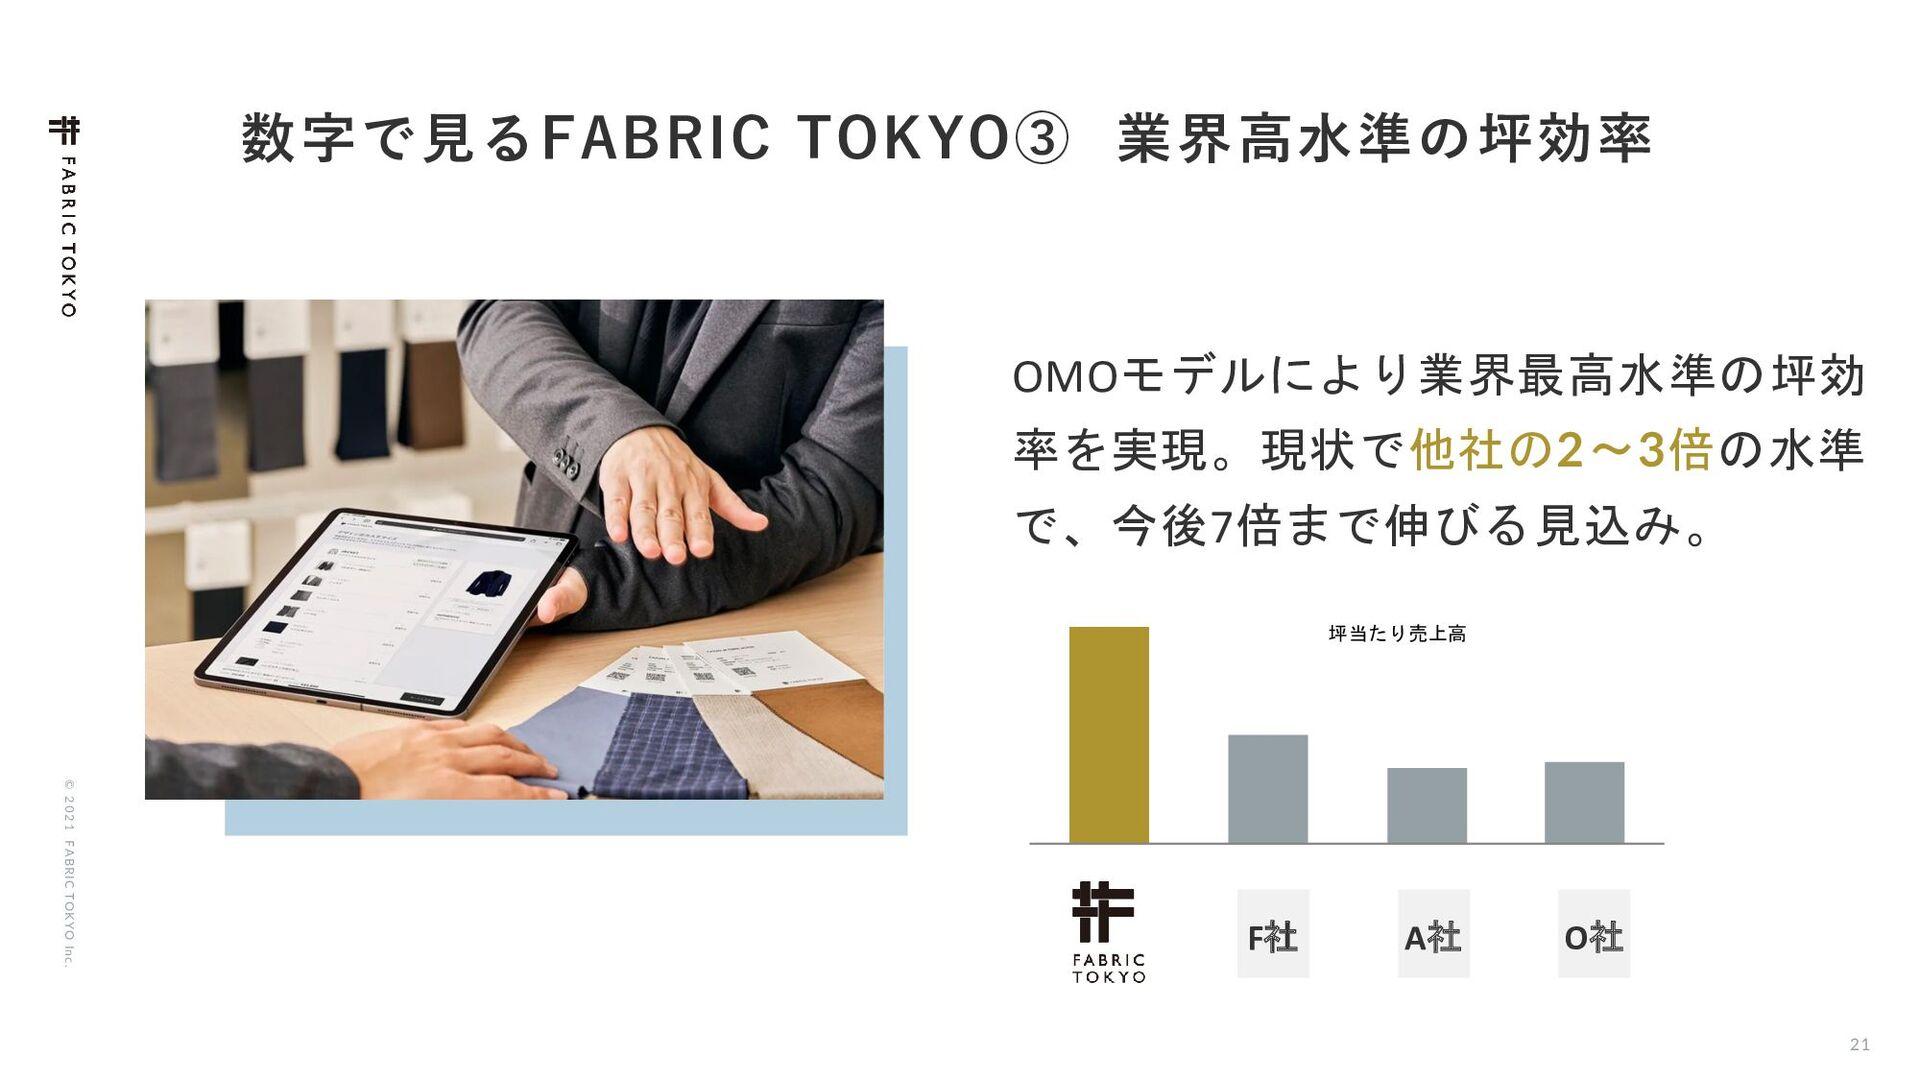 "© 2021 FABRIC TOKYO Inc. 21 ͰݟΔ'""#3*$50,:0ᶅ ..."